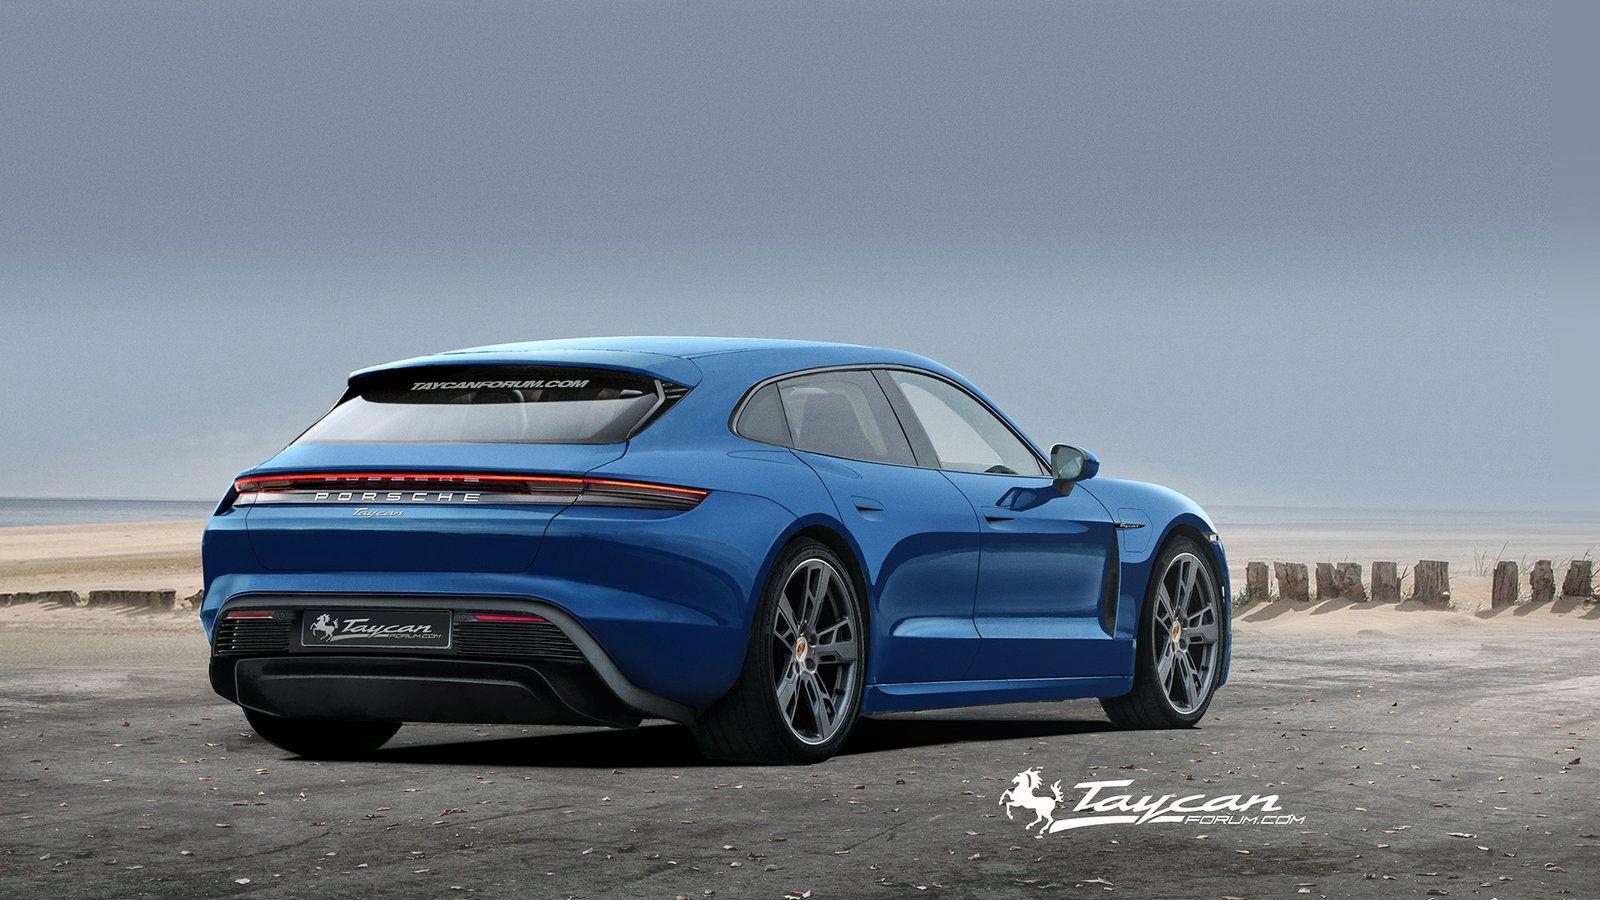 2020 Porsche Taycan Sport Turismo Ev Auto S En Motoren Motor Auto S